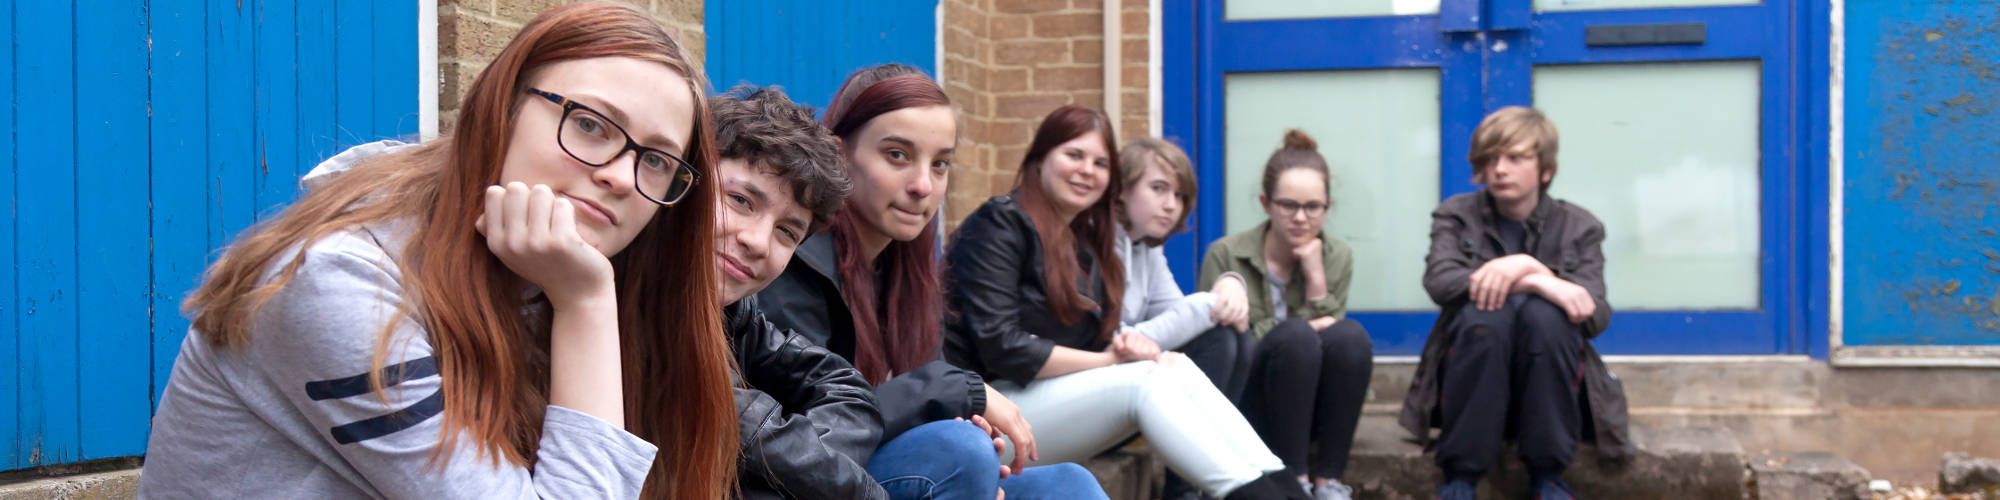 A row of seated teens